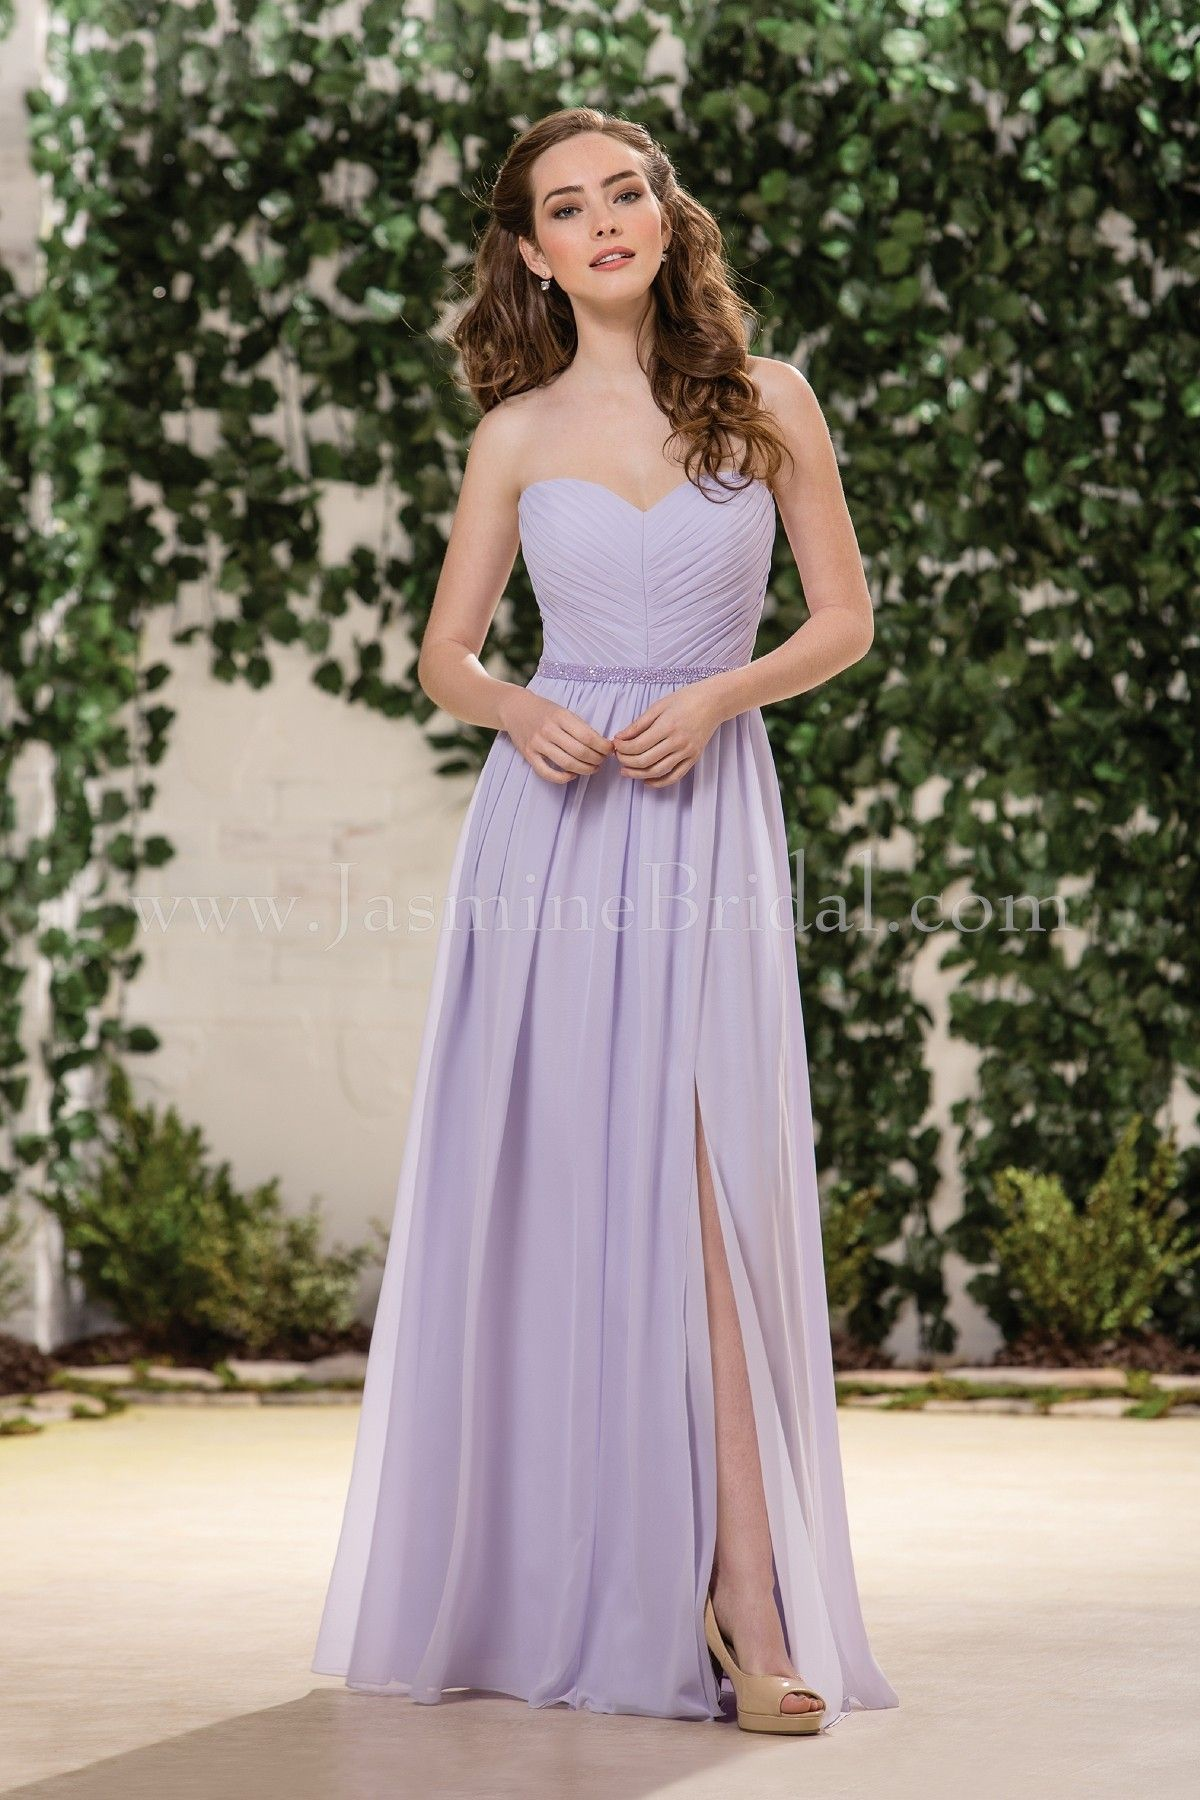 Jasmine Bridal Bridesmaid Dress B2 Style B183055 in Lavender Ice ...